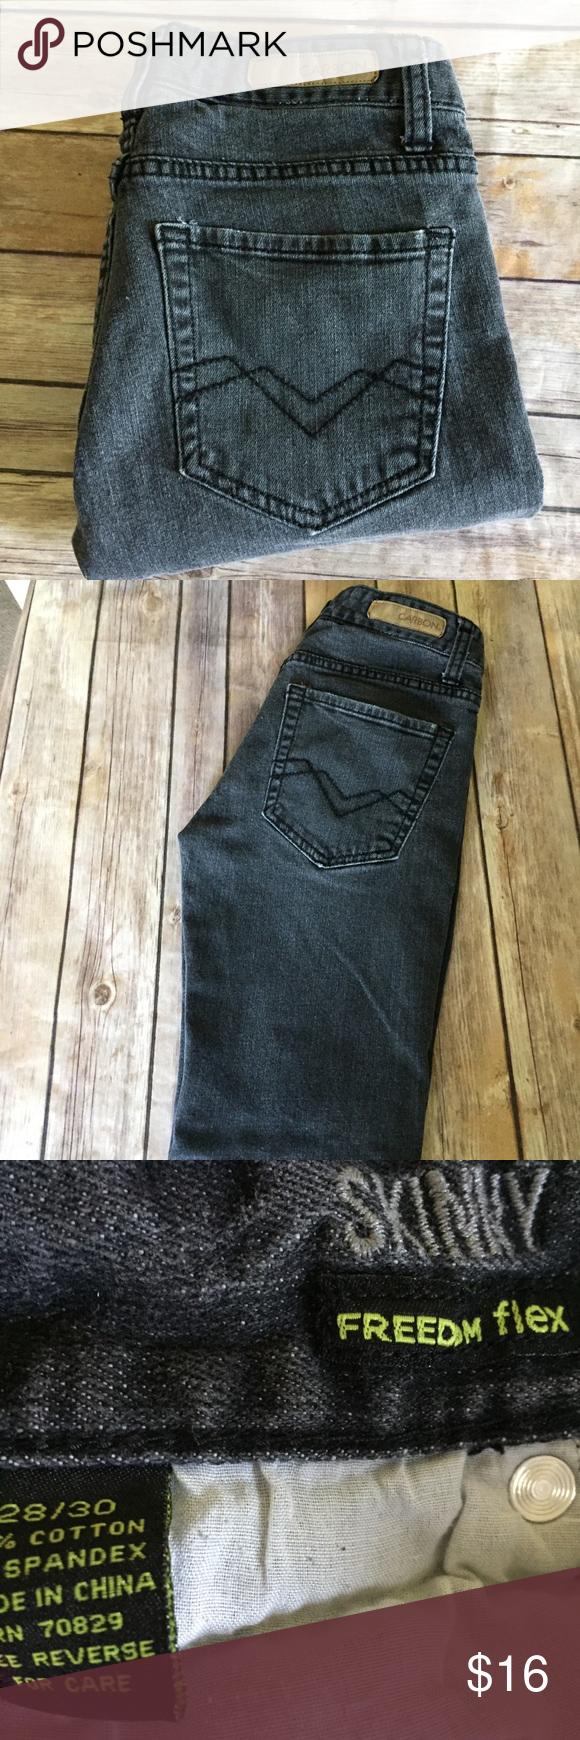 Carbon Jeans Gray Black 28x30 Freedom Flex Skinny Jean Grey Clothes Design Skinny